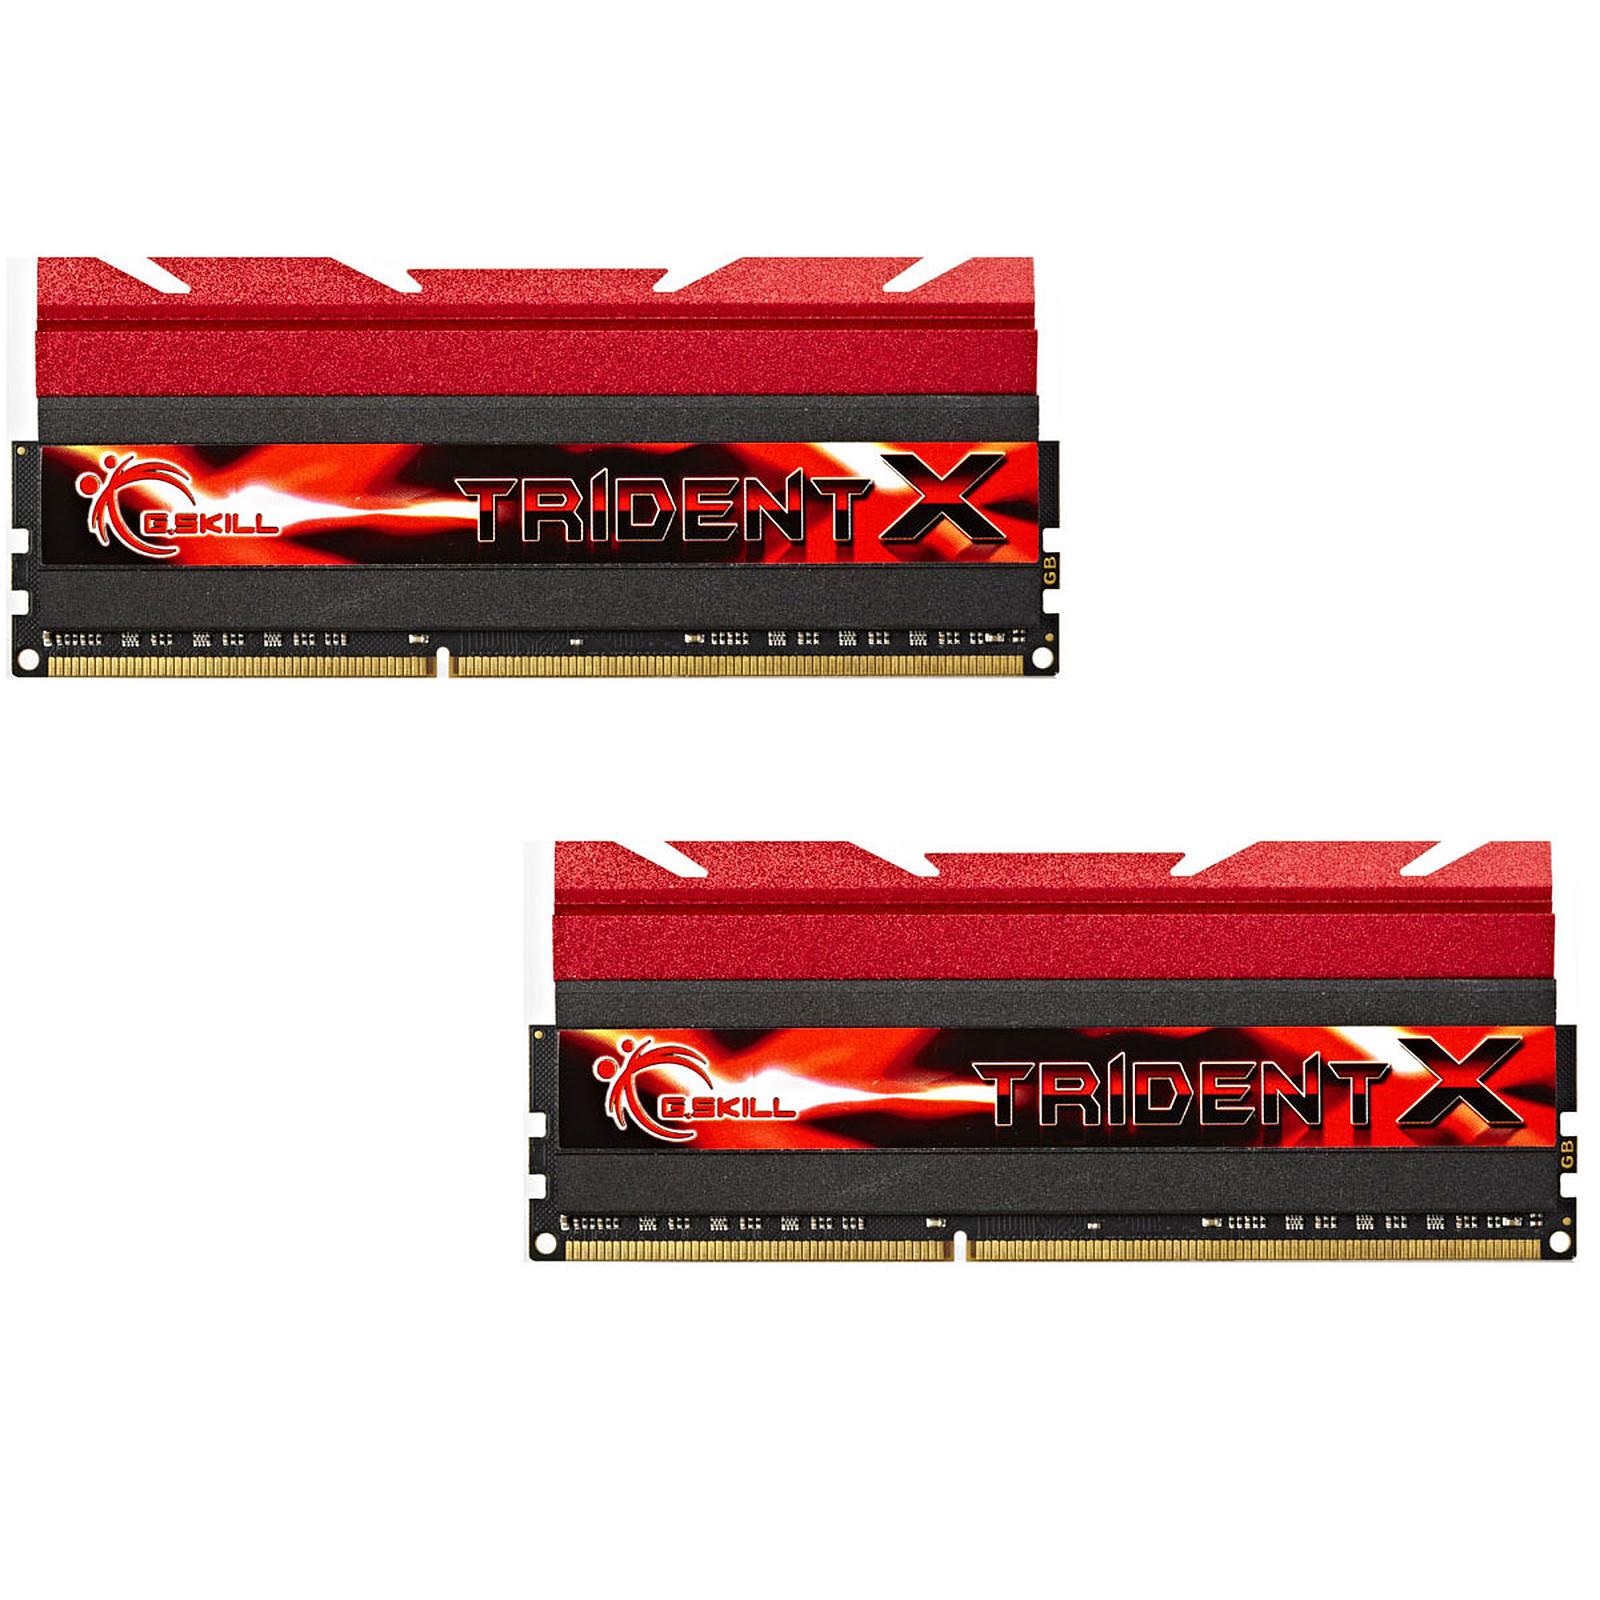 G.Skill Trident X Series 16 Go (2 x 8 Go) DDR3 2133 MHz CL9